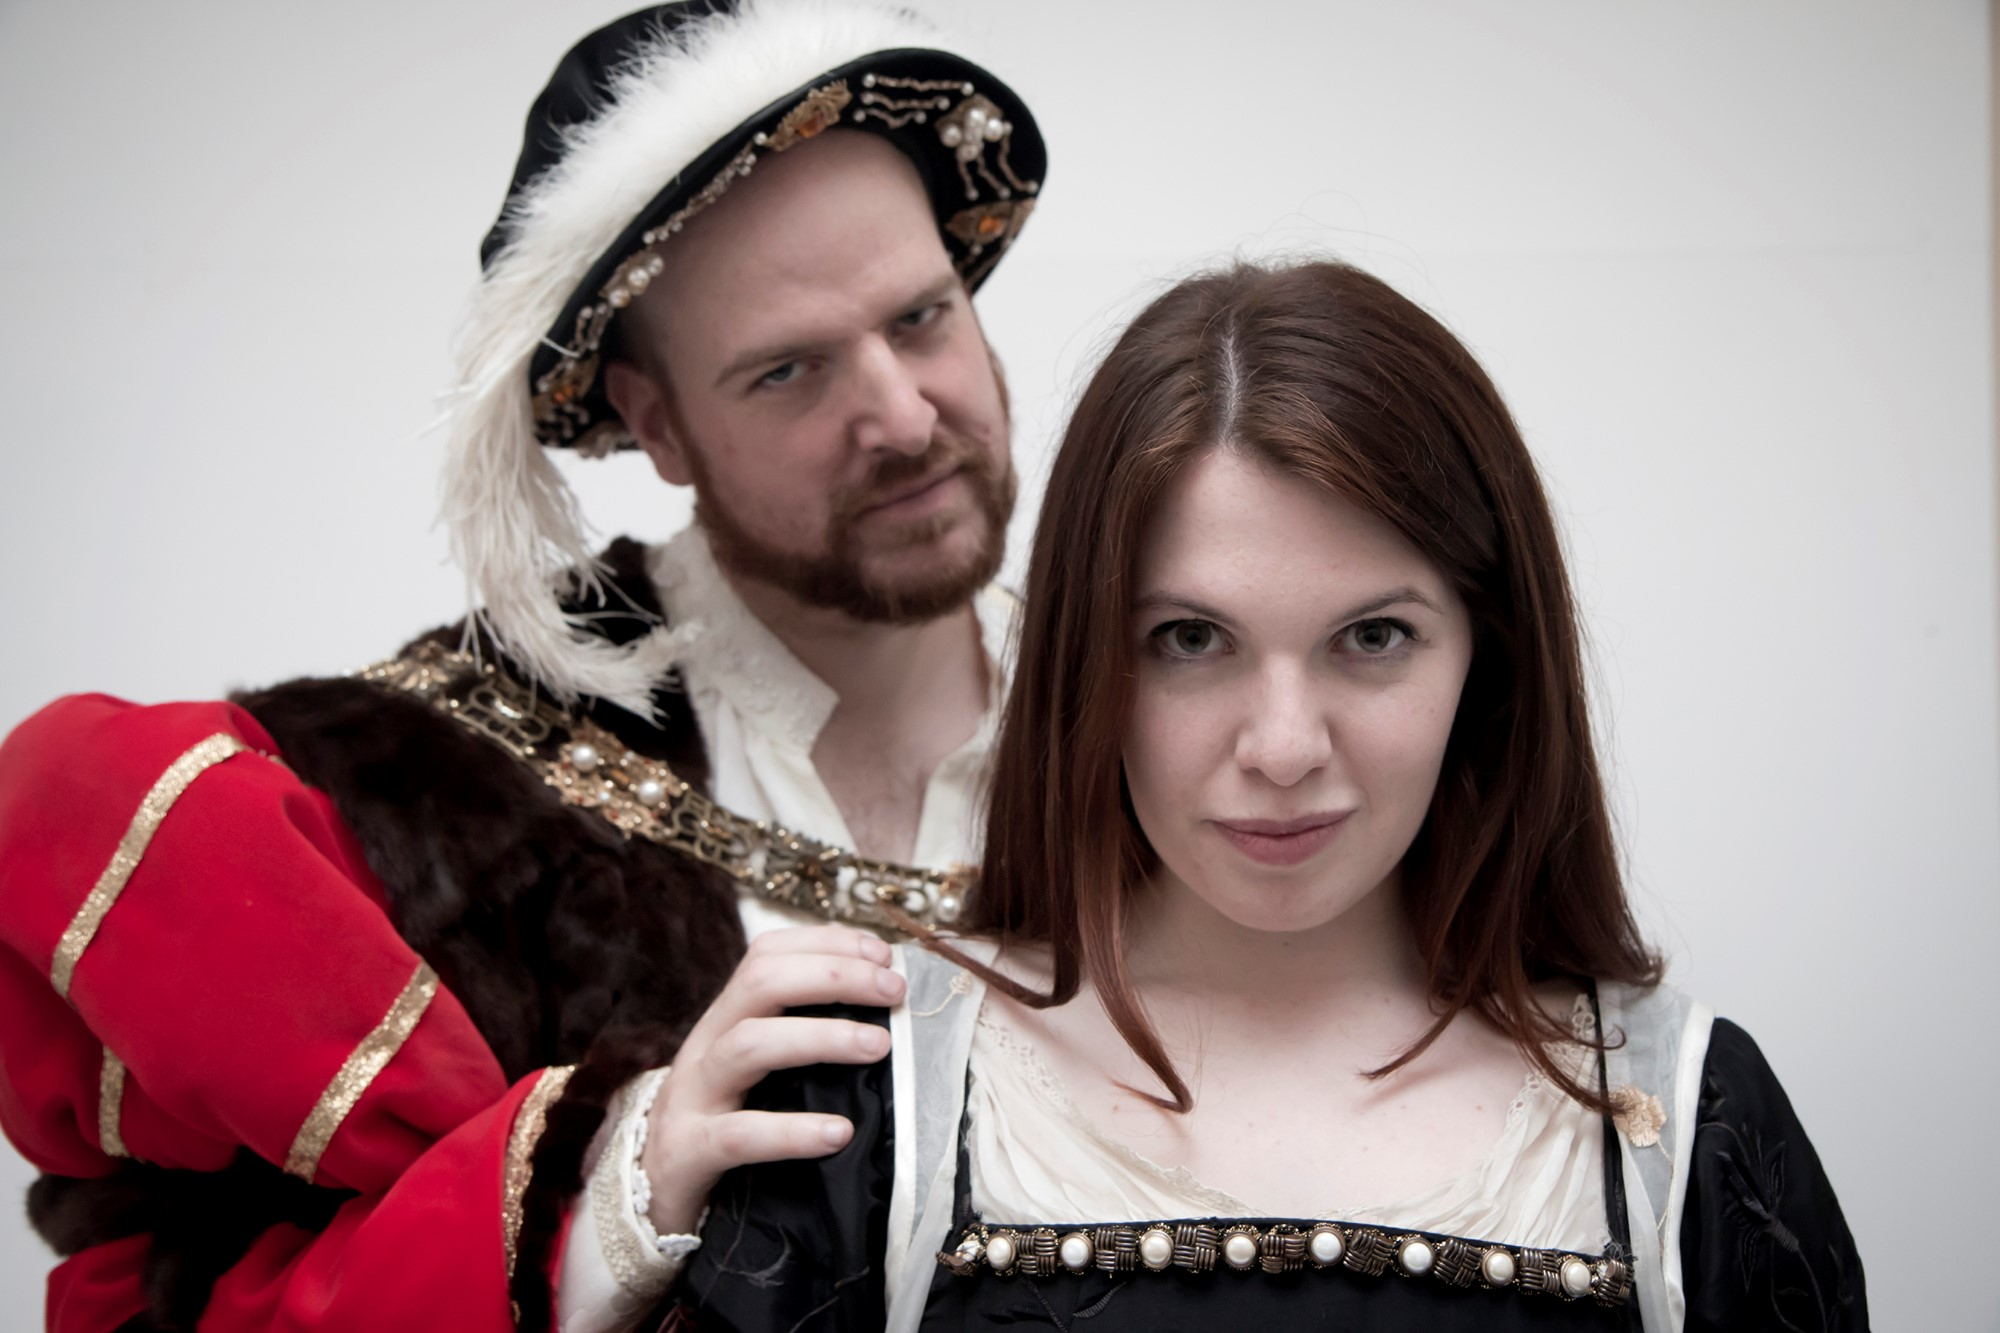 catherine howard and henry viii the jorvik group of